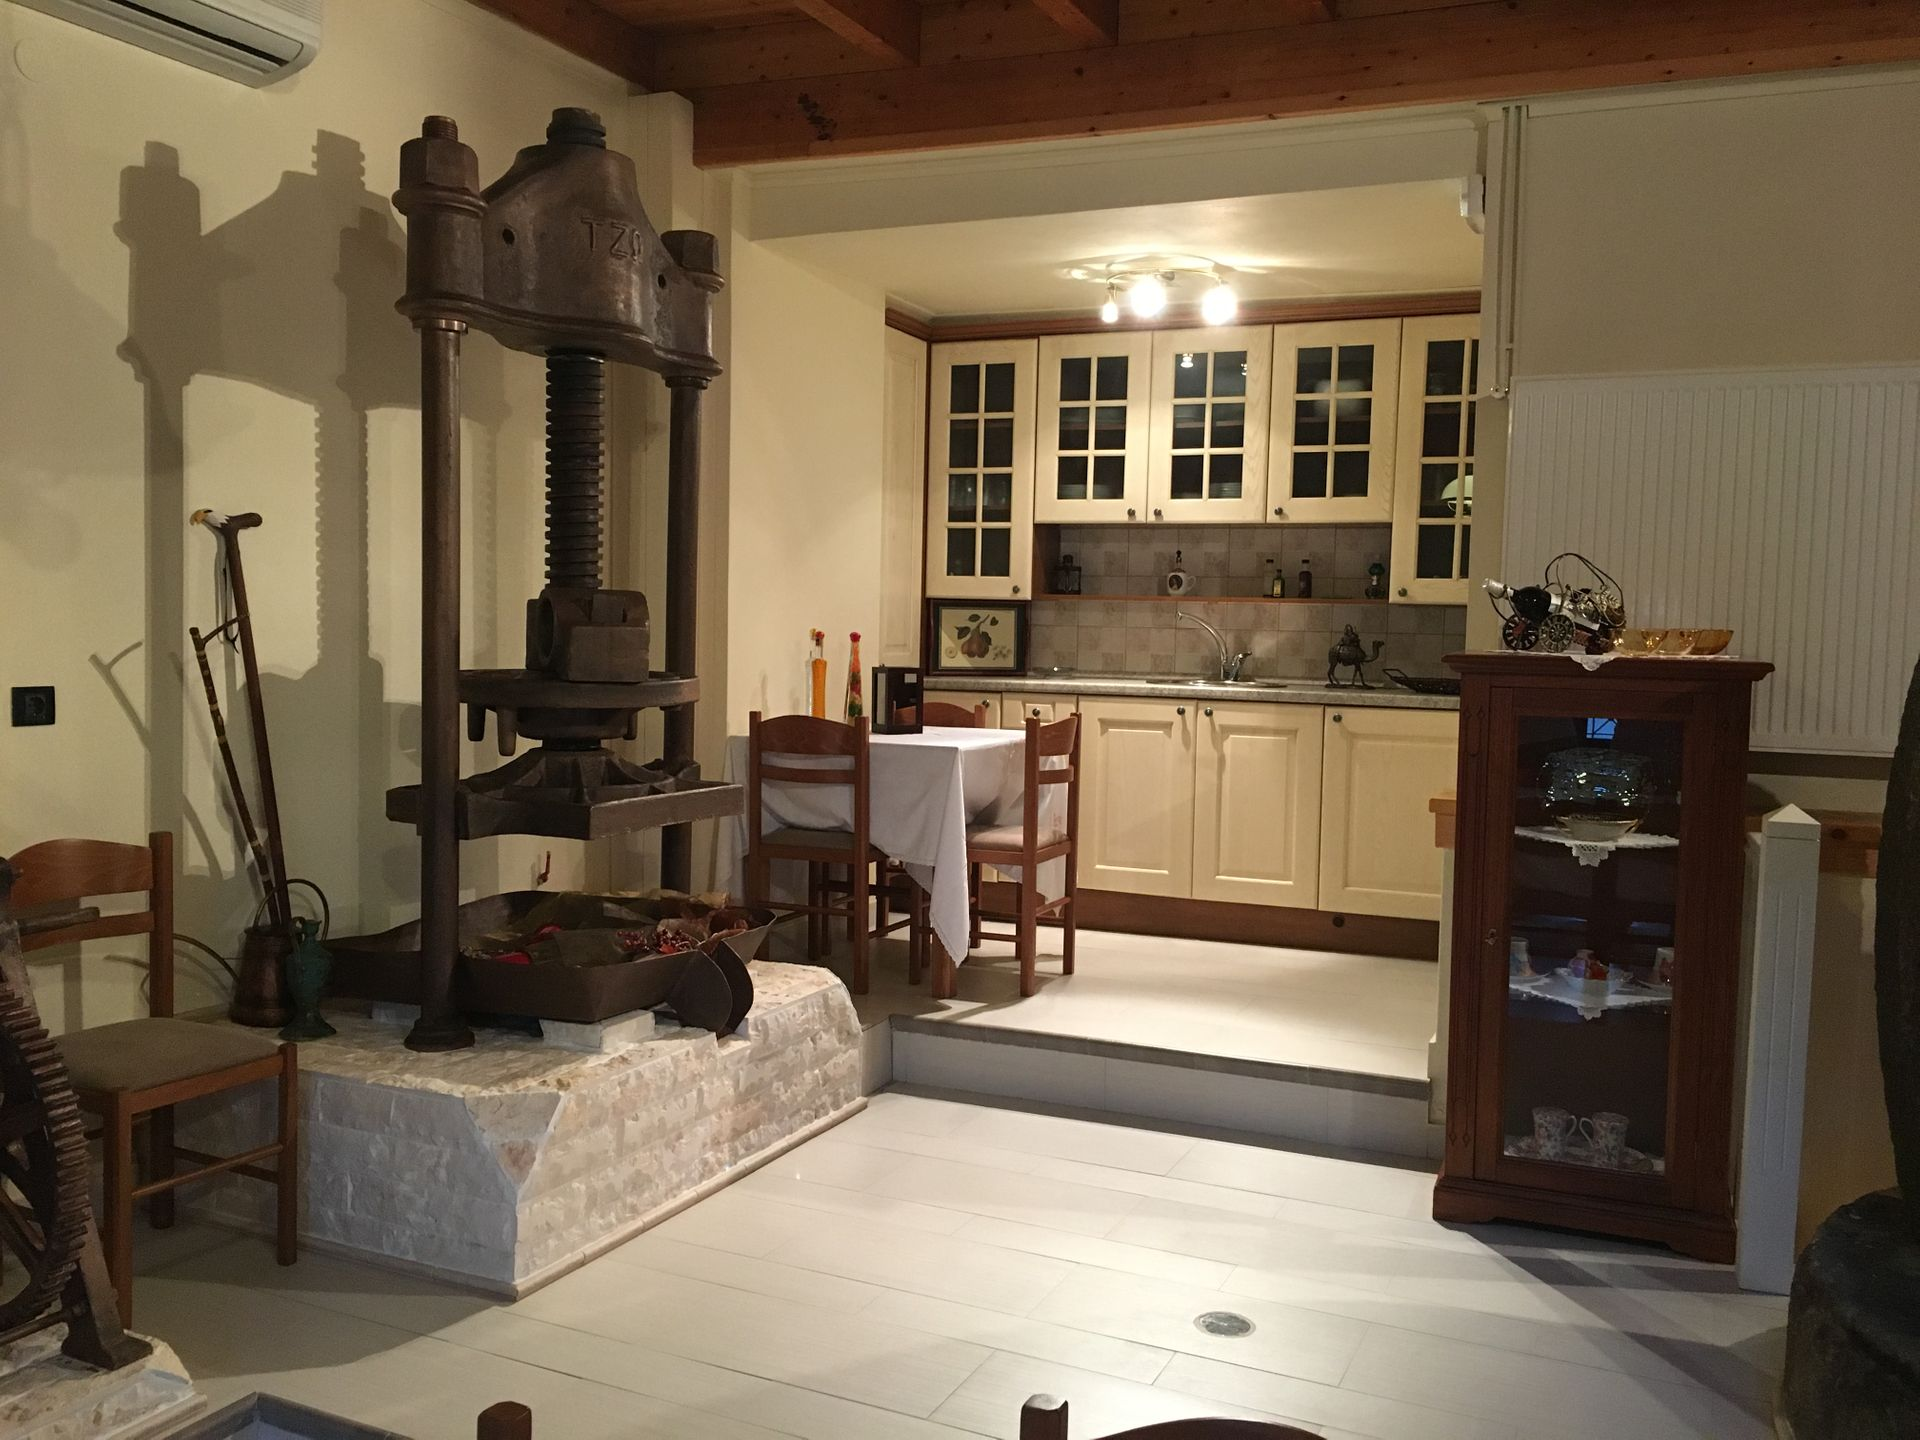 Olive House Retreat   Kourouklata - Kefalonia Apartments, Kefalonia ...